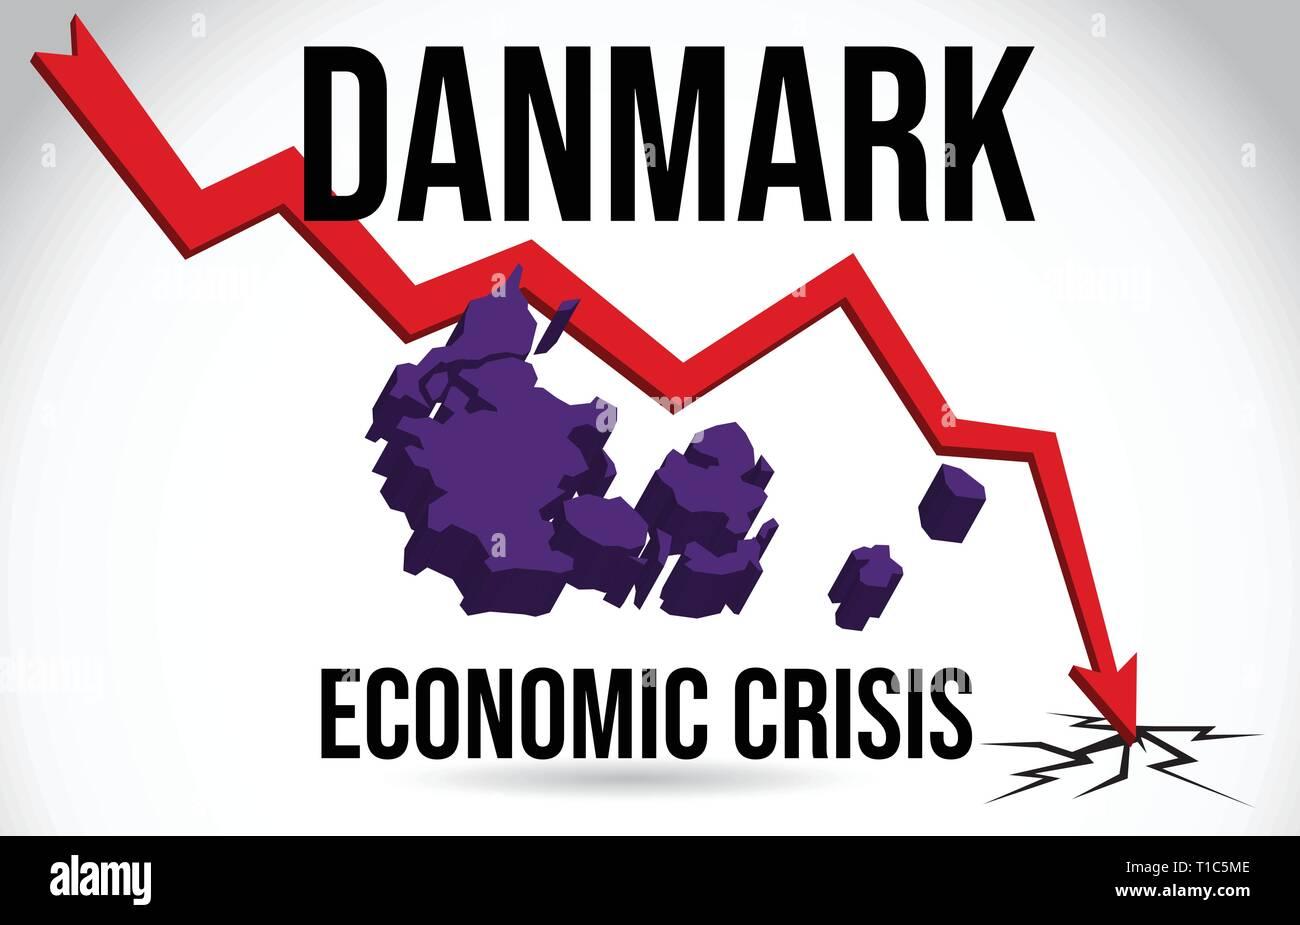 Danmark Map Financial Crisis Economic Collapse Market Crash Global Meltdown Vector Illustration. - Stock Vector